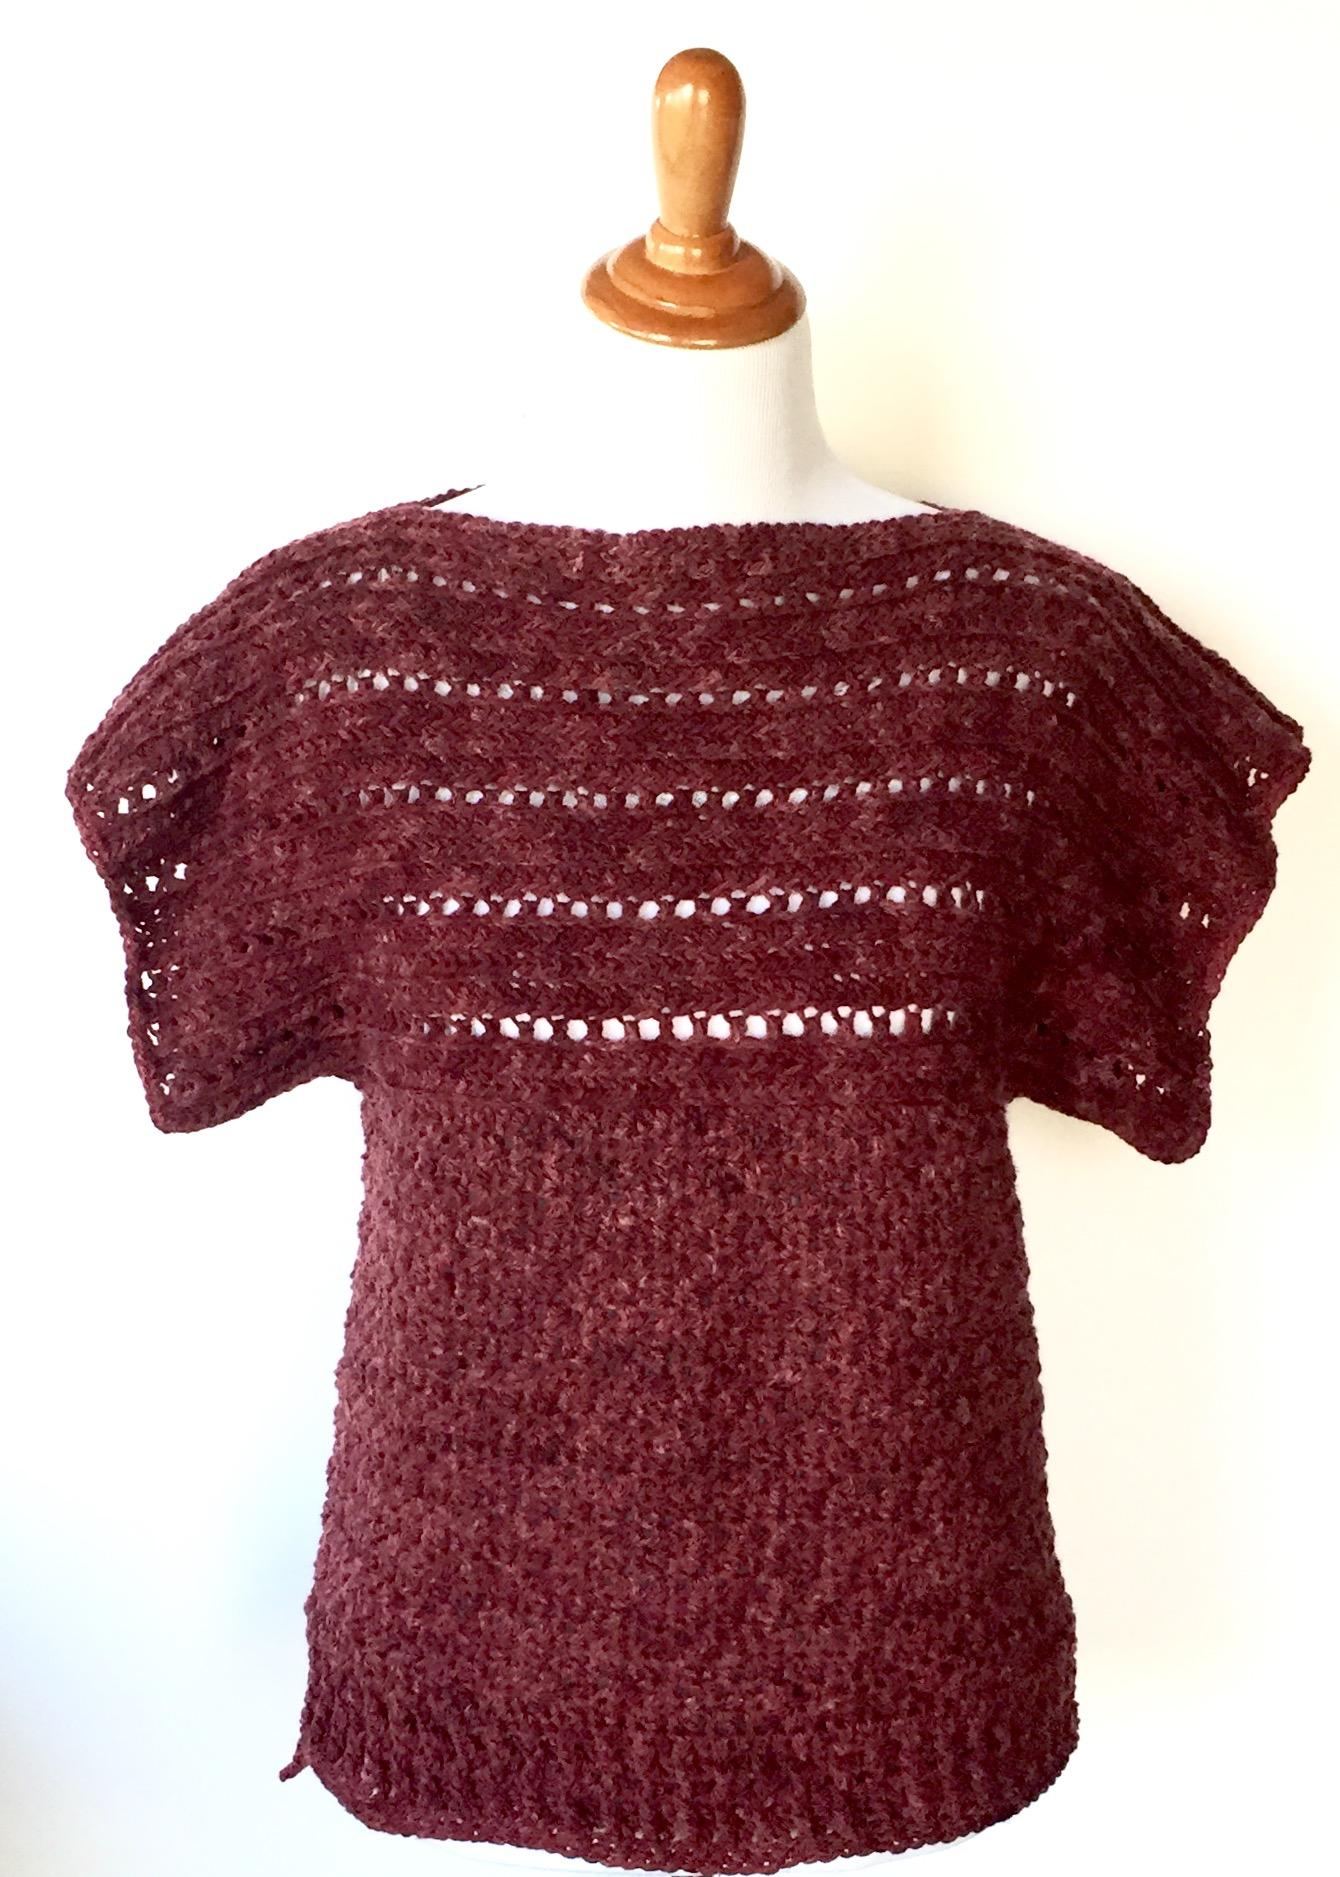 Xl Crochet Patterns : Home / Crochet Patterns / Ponchos/Shawls Crochet Patterns / Ruth ...